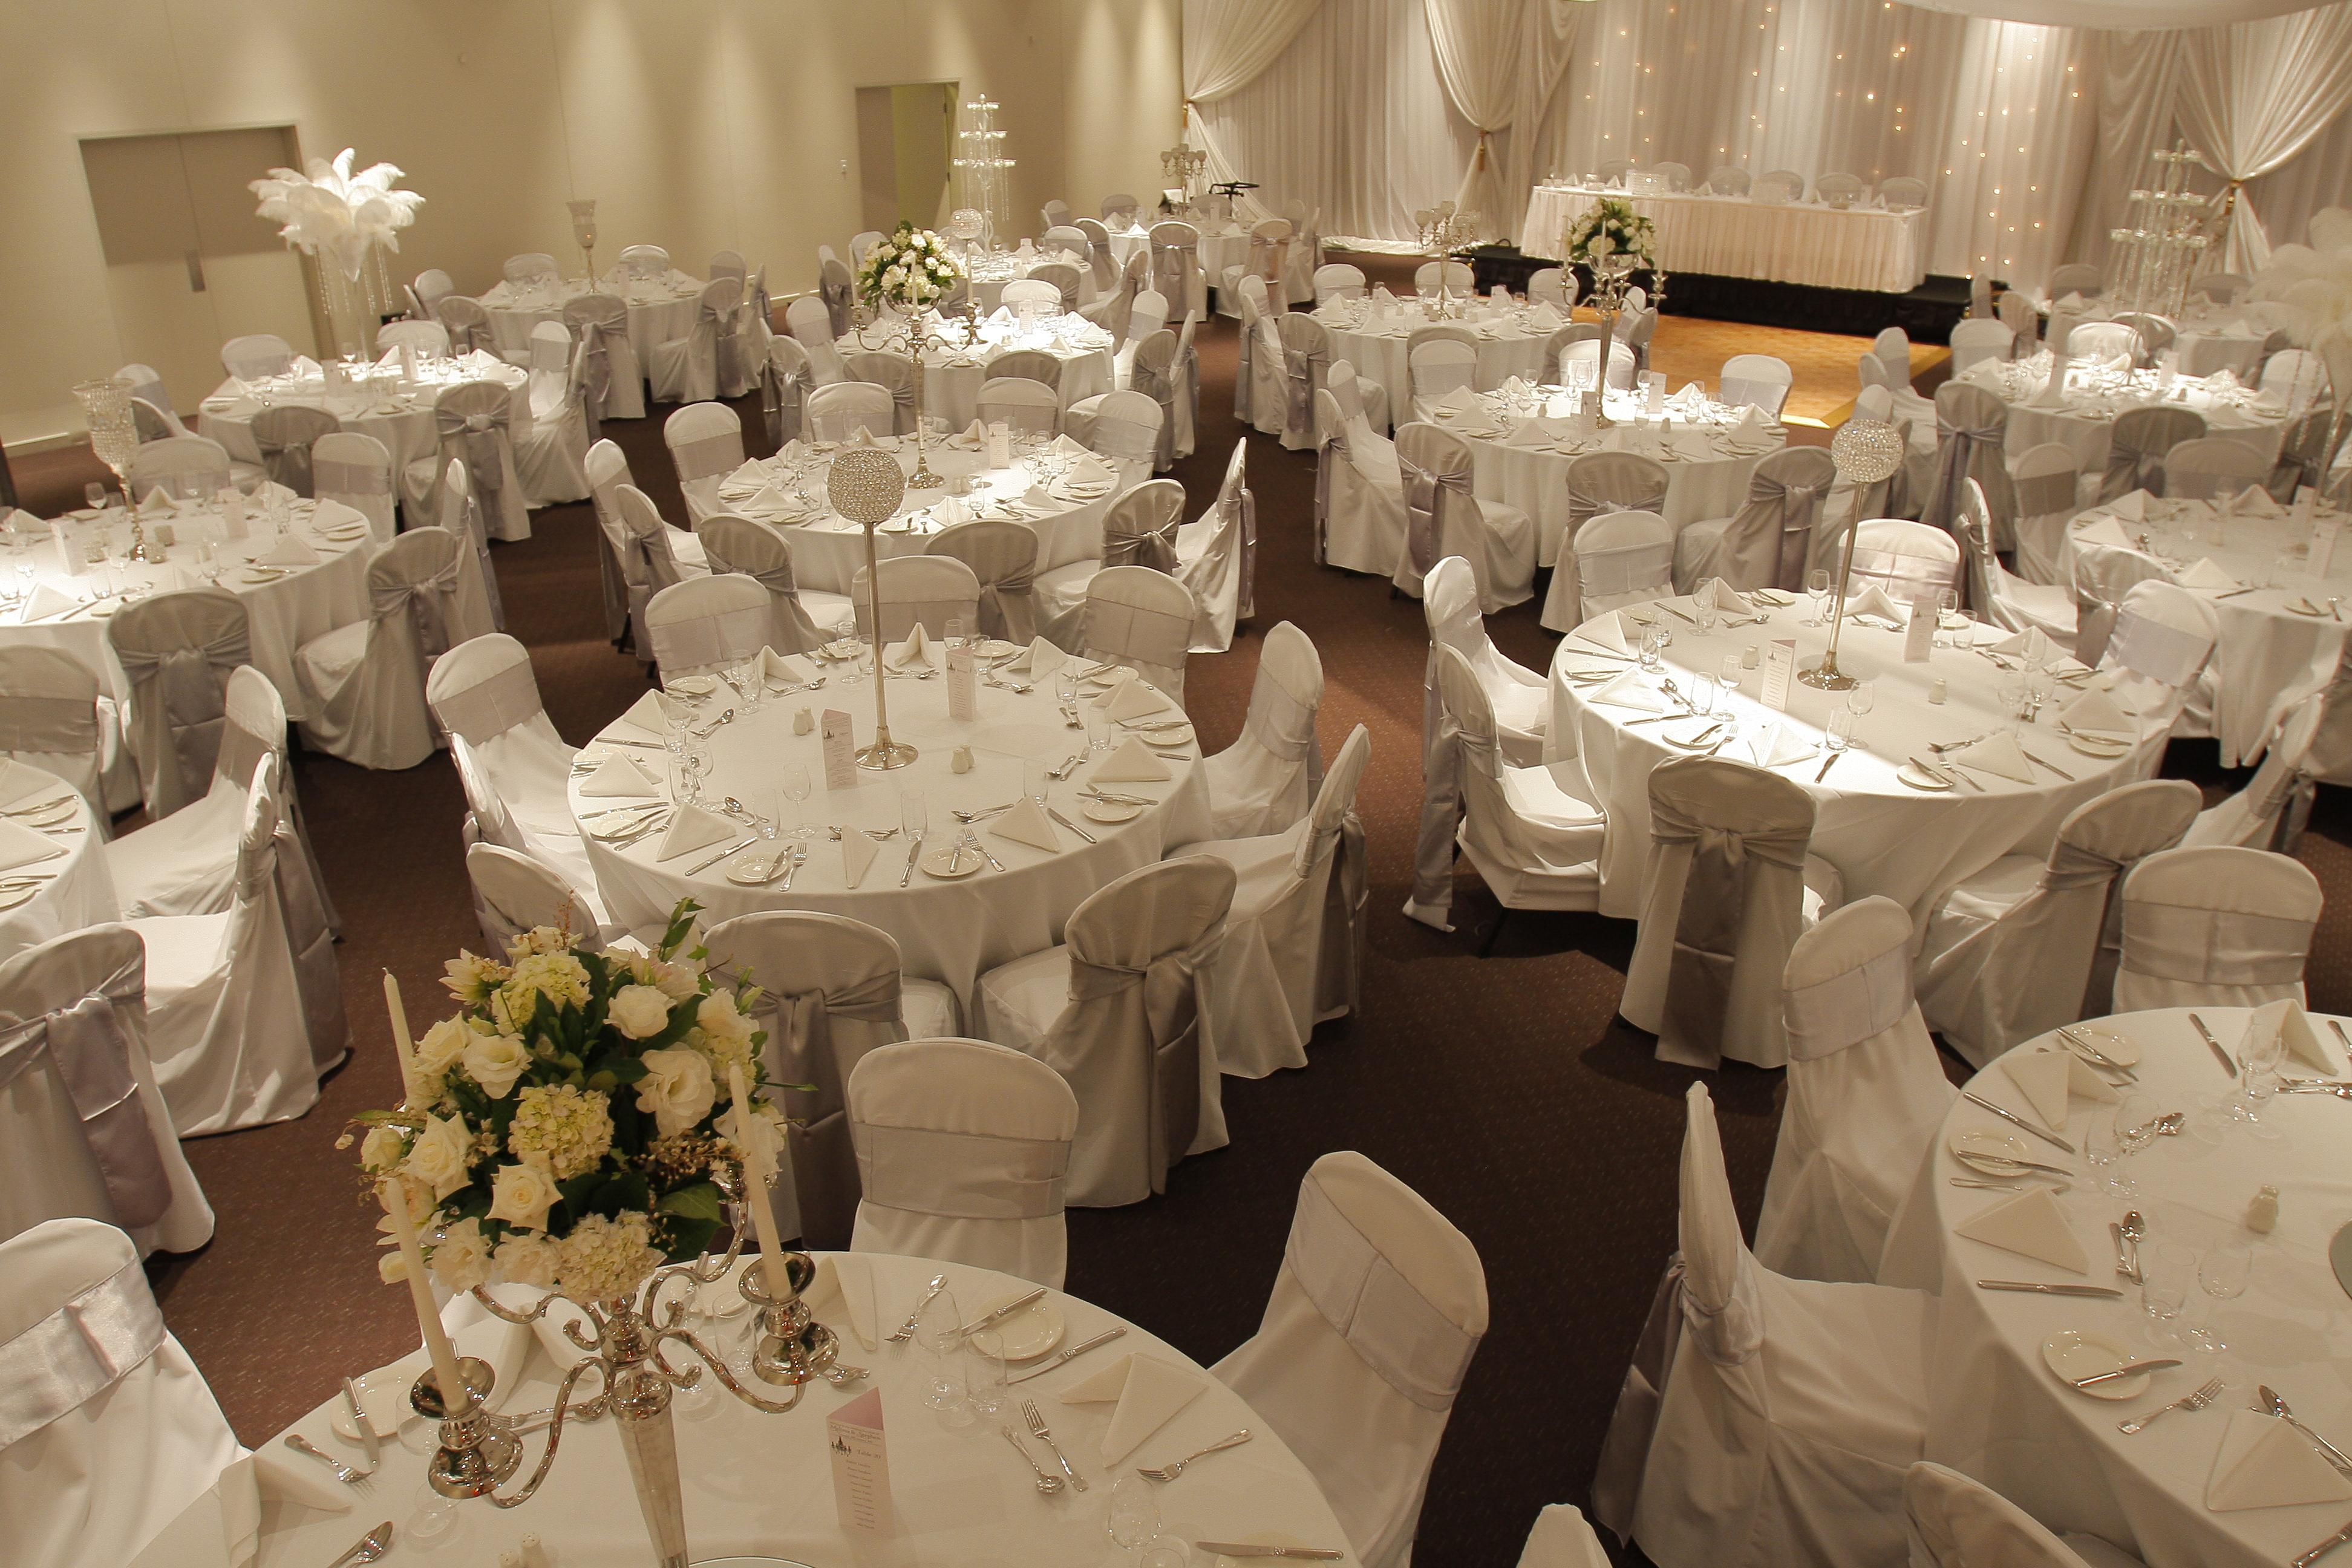 Sage Hotel Wollongong Wedding Venue In Wollongong Bridestory